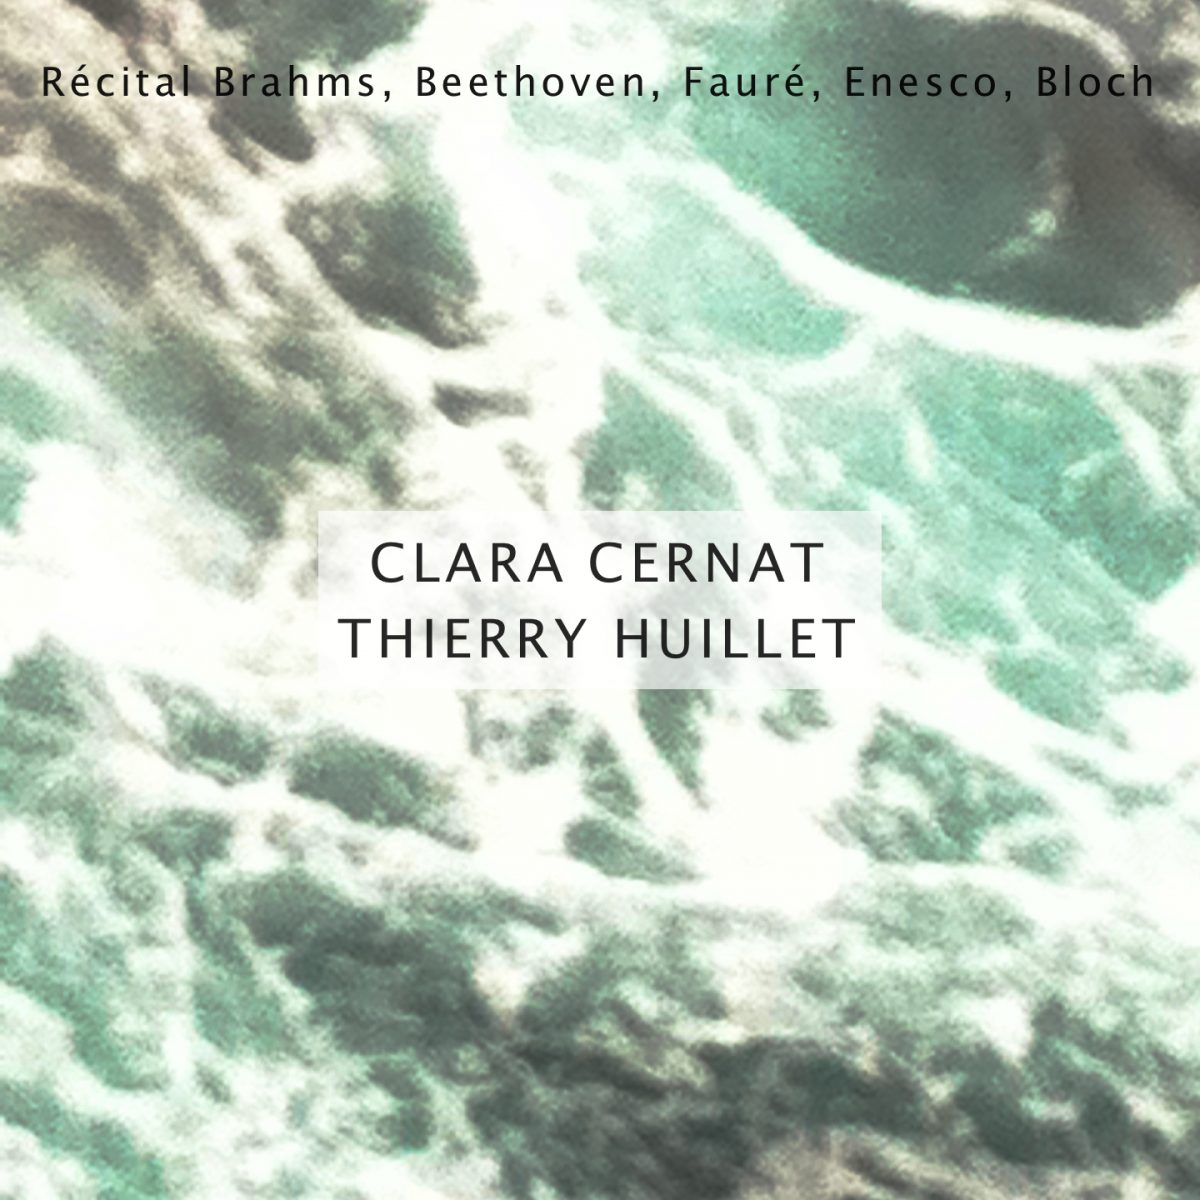 Clara Cernat & Thierry Huillet – Recital Brahms, Beethoven, Faure, Enesco, Bloch